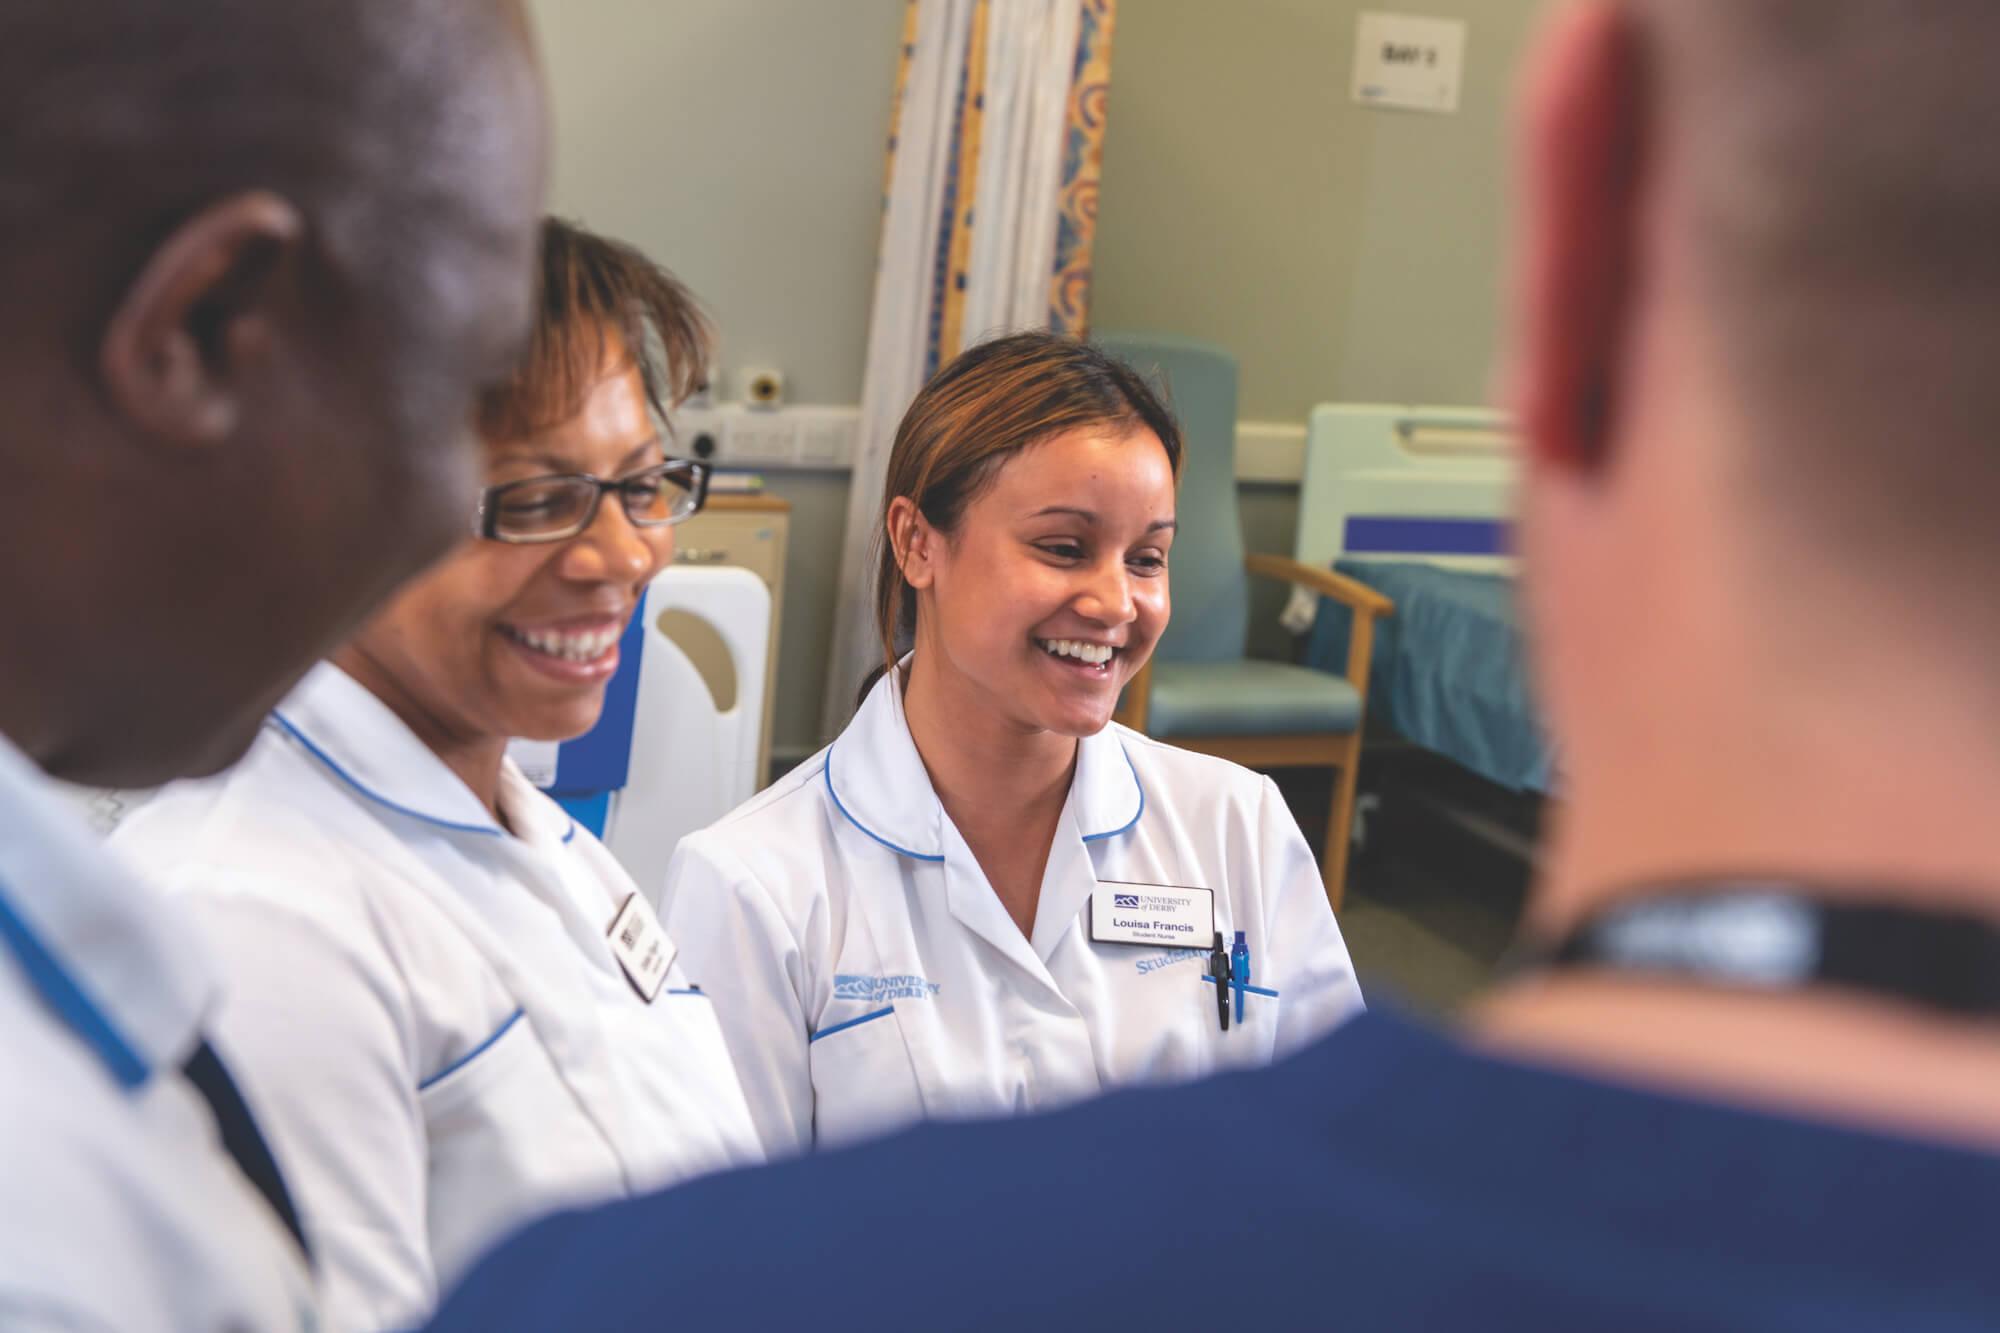 Trainee nurses in conversation